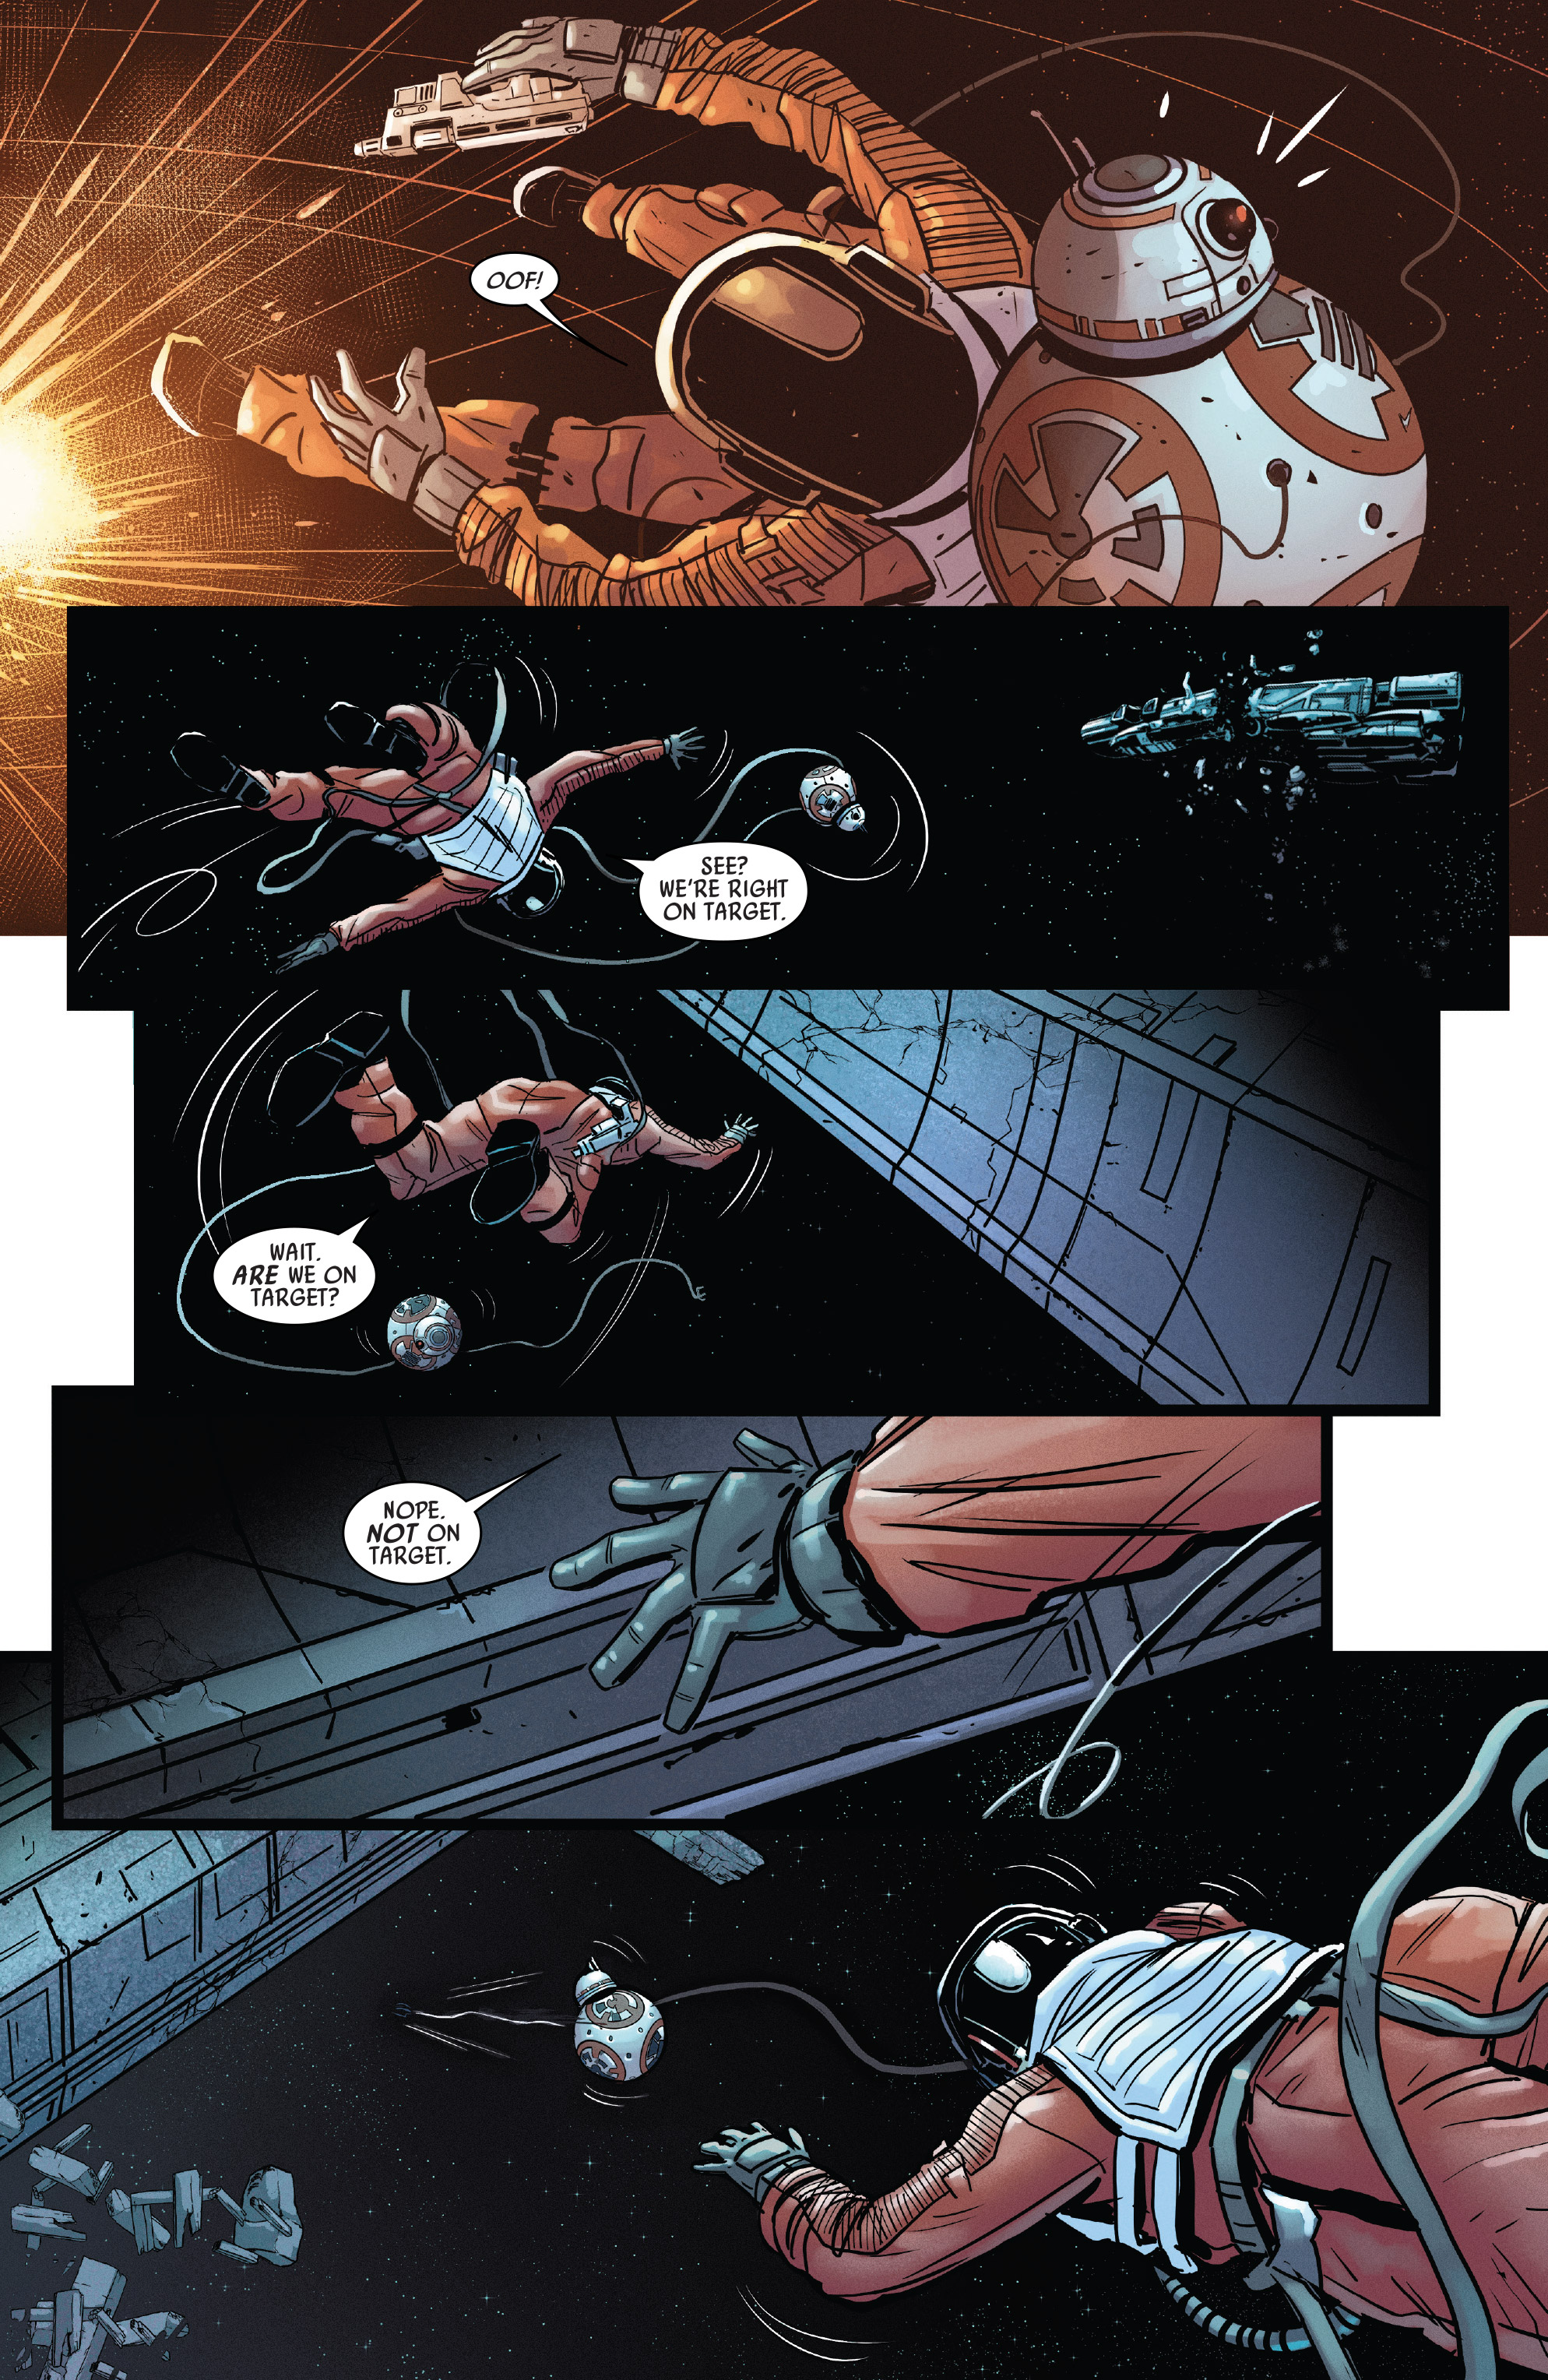 Read online Star Wars: Poe Dameron comic -  Issue # _Annual 1 - 11